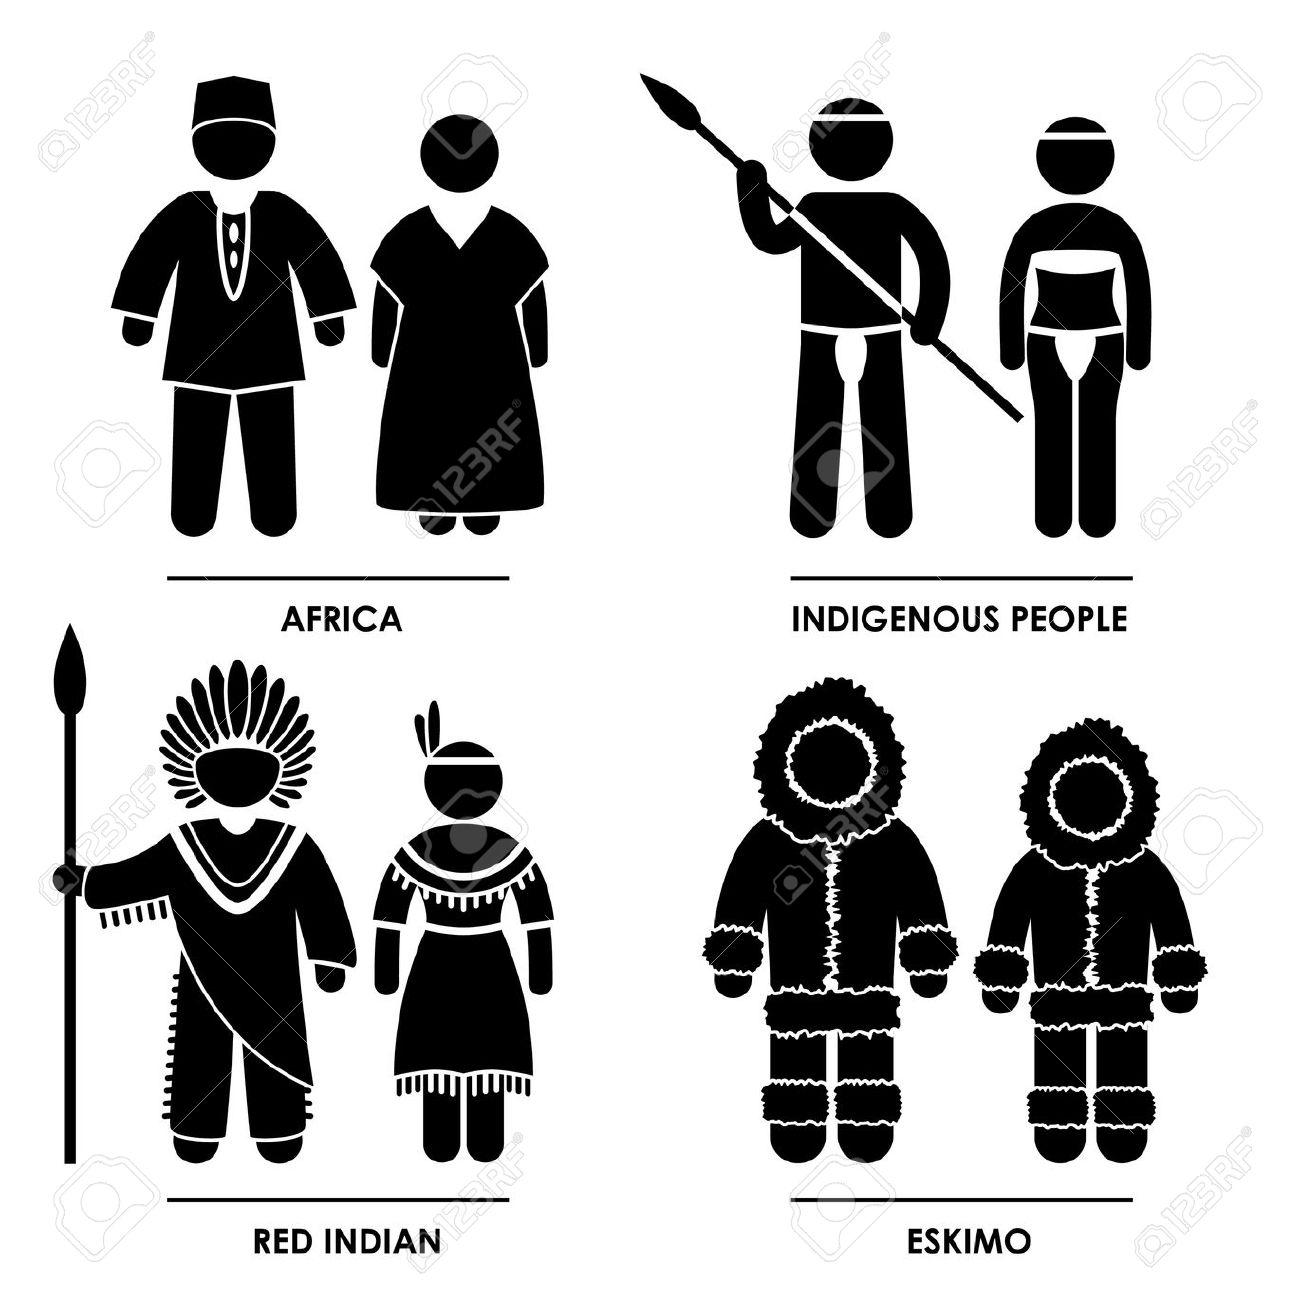 Indigenous clipart.